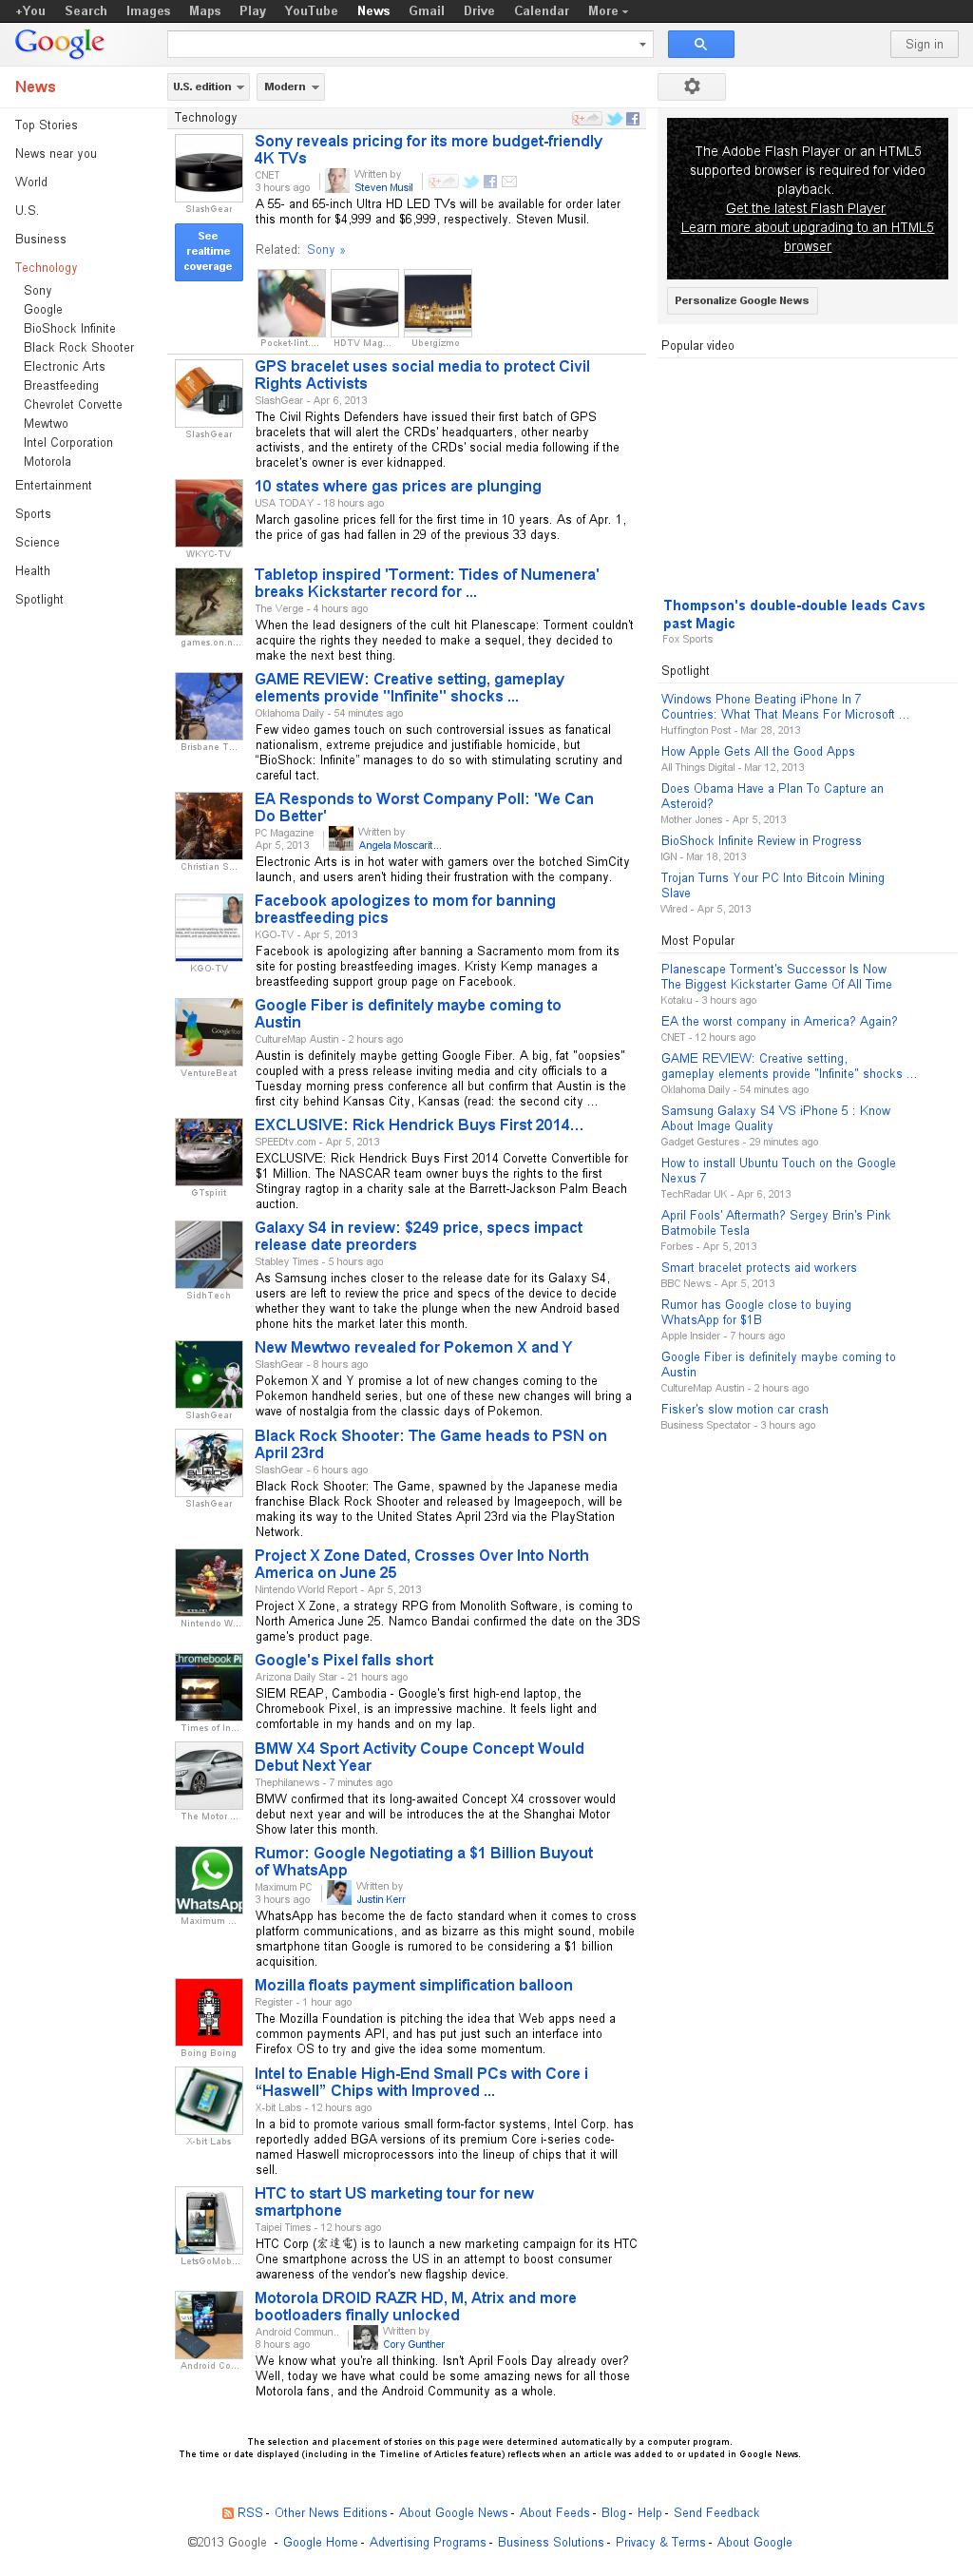 Google News: Technology at Monday April 8, 2013, 4:08 a.m. UTC